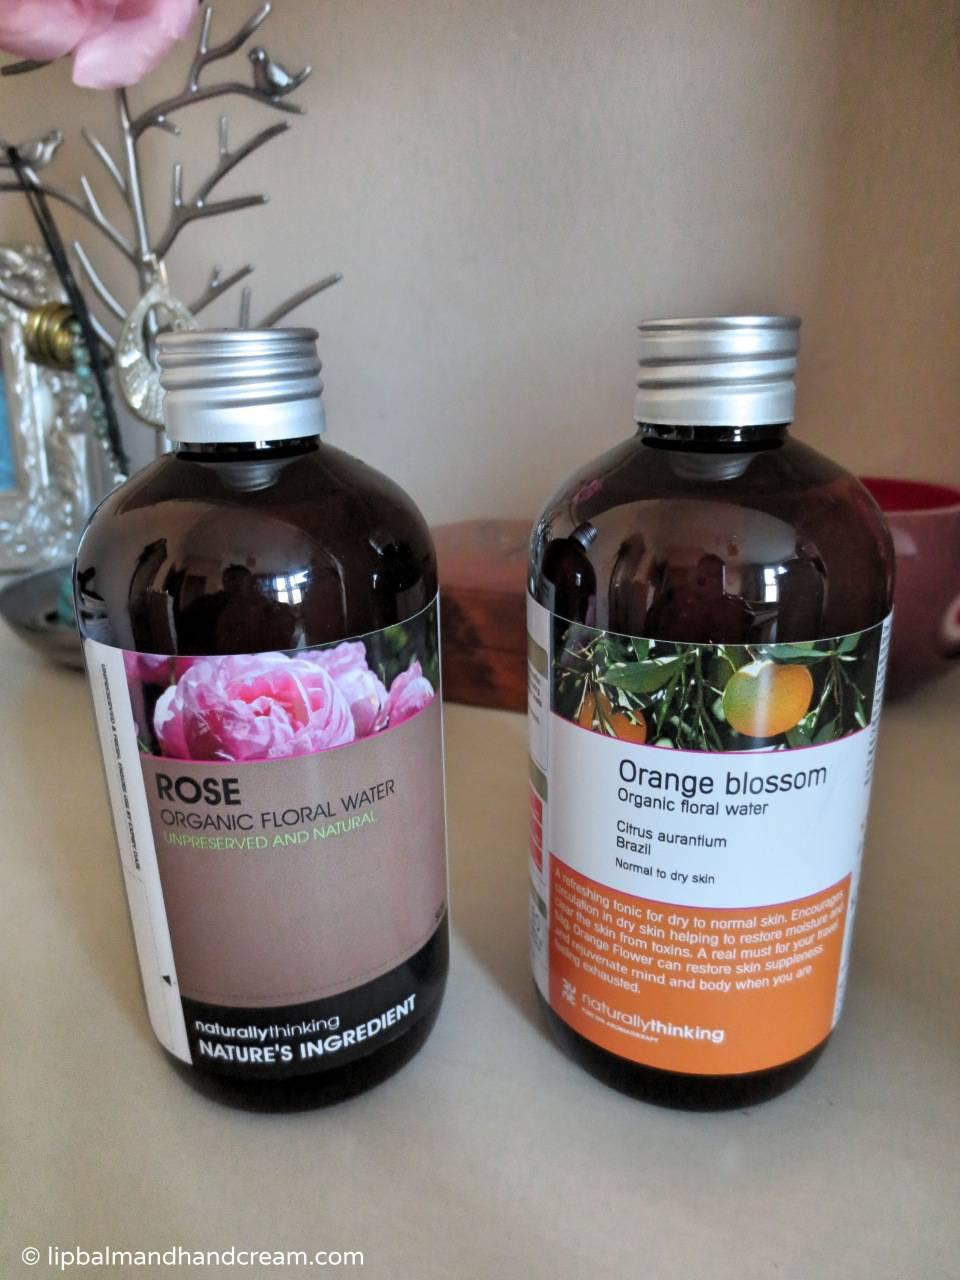 Natural toner made of rose and orange floral waters